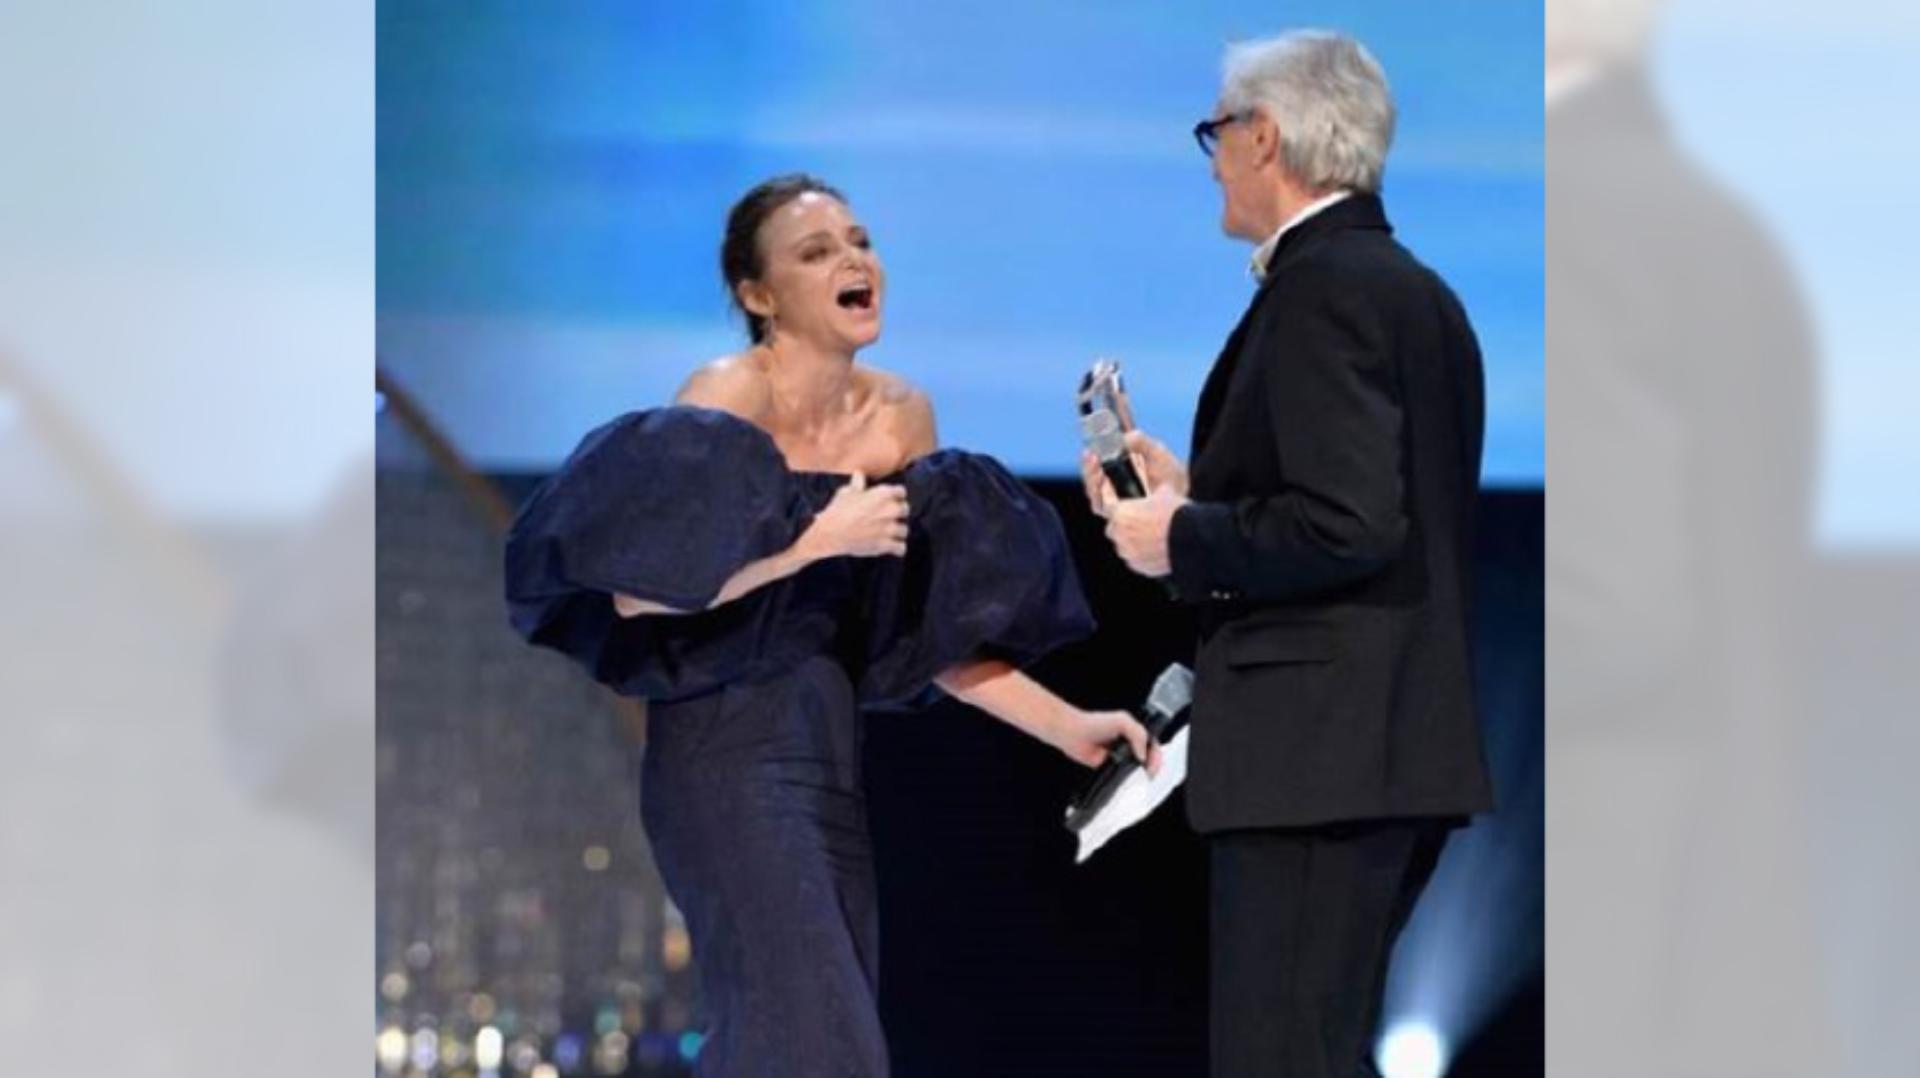 James Dyson and Stella McCartney, at the British Fashion Awards